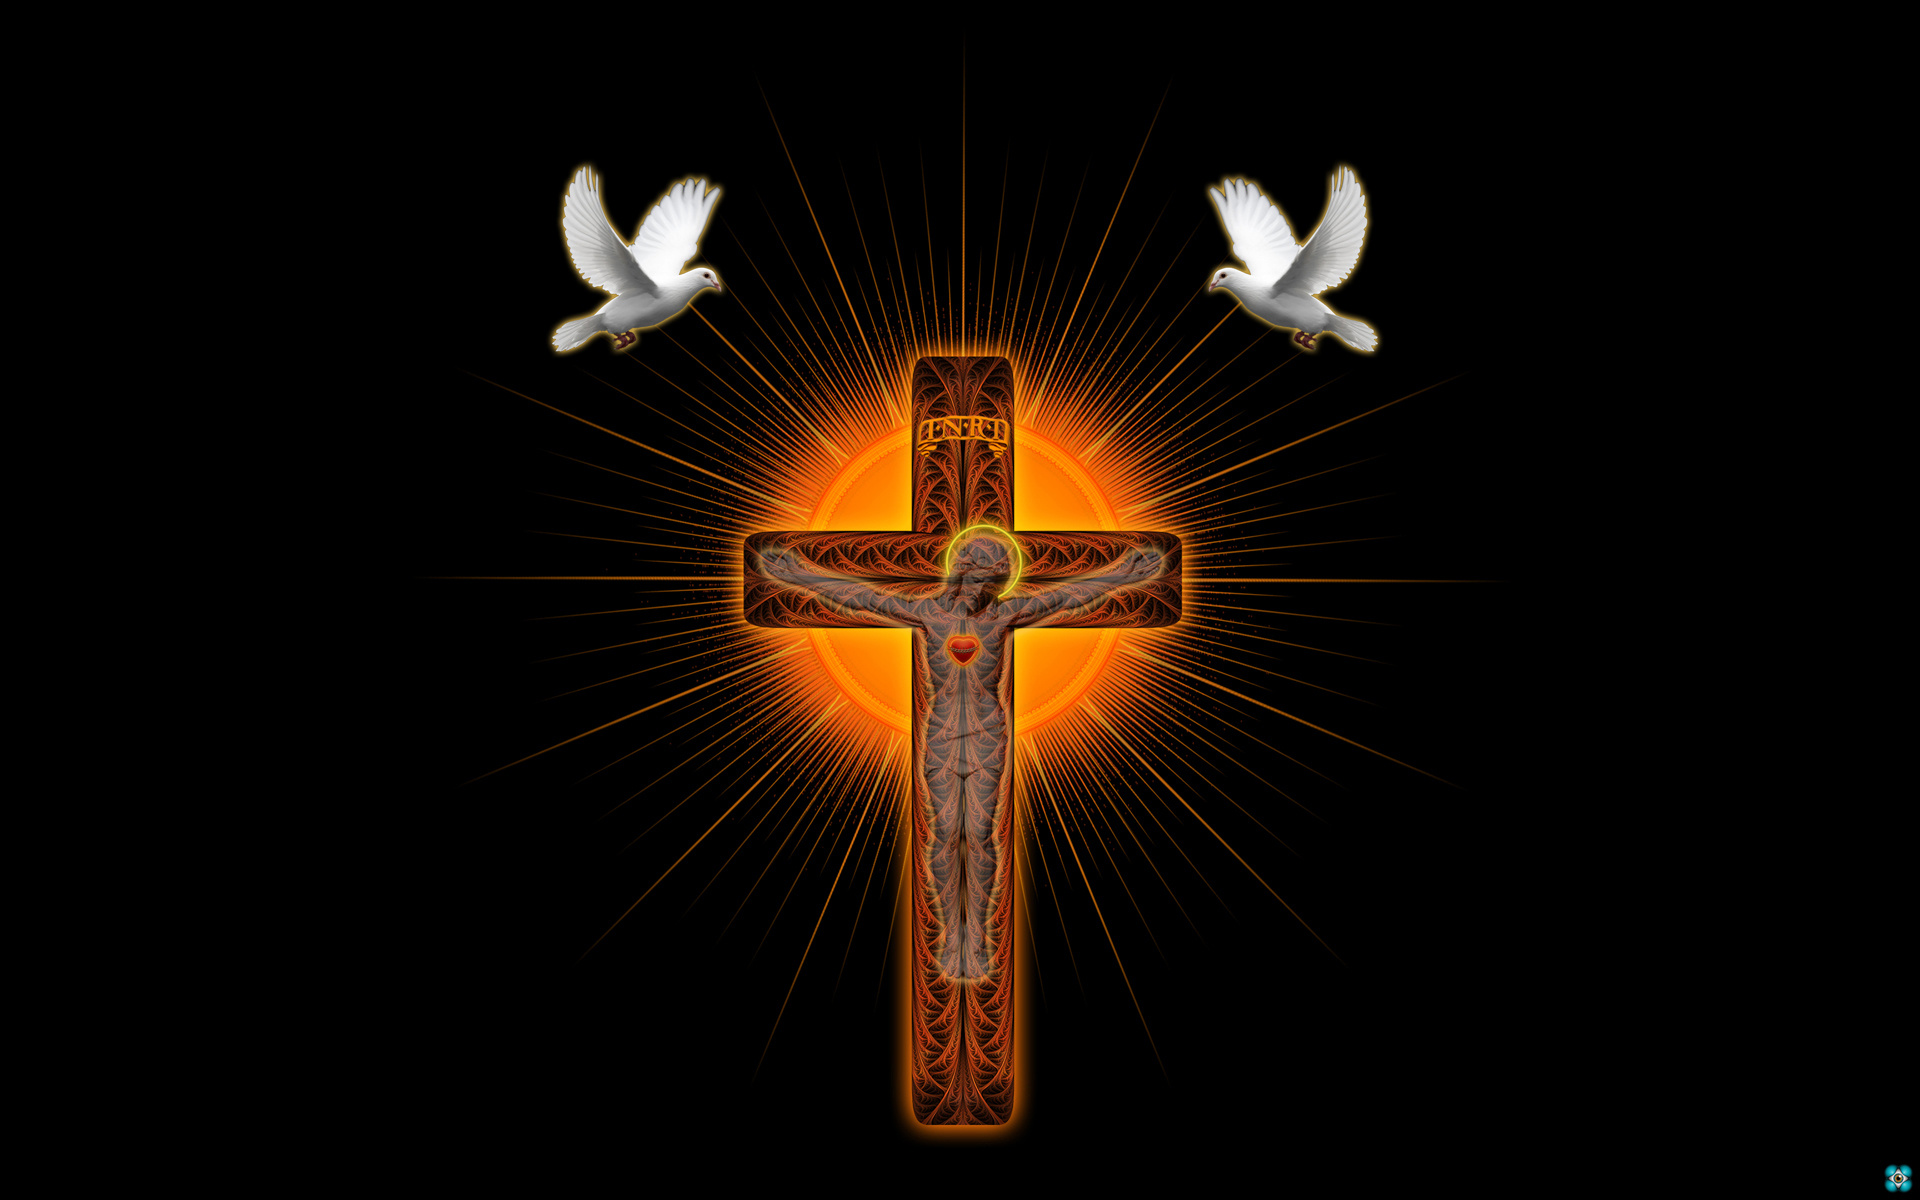 art religion catholic jesus doves birds symbols wallpaper background 1920x1200